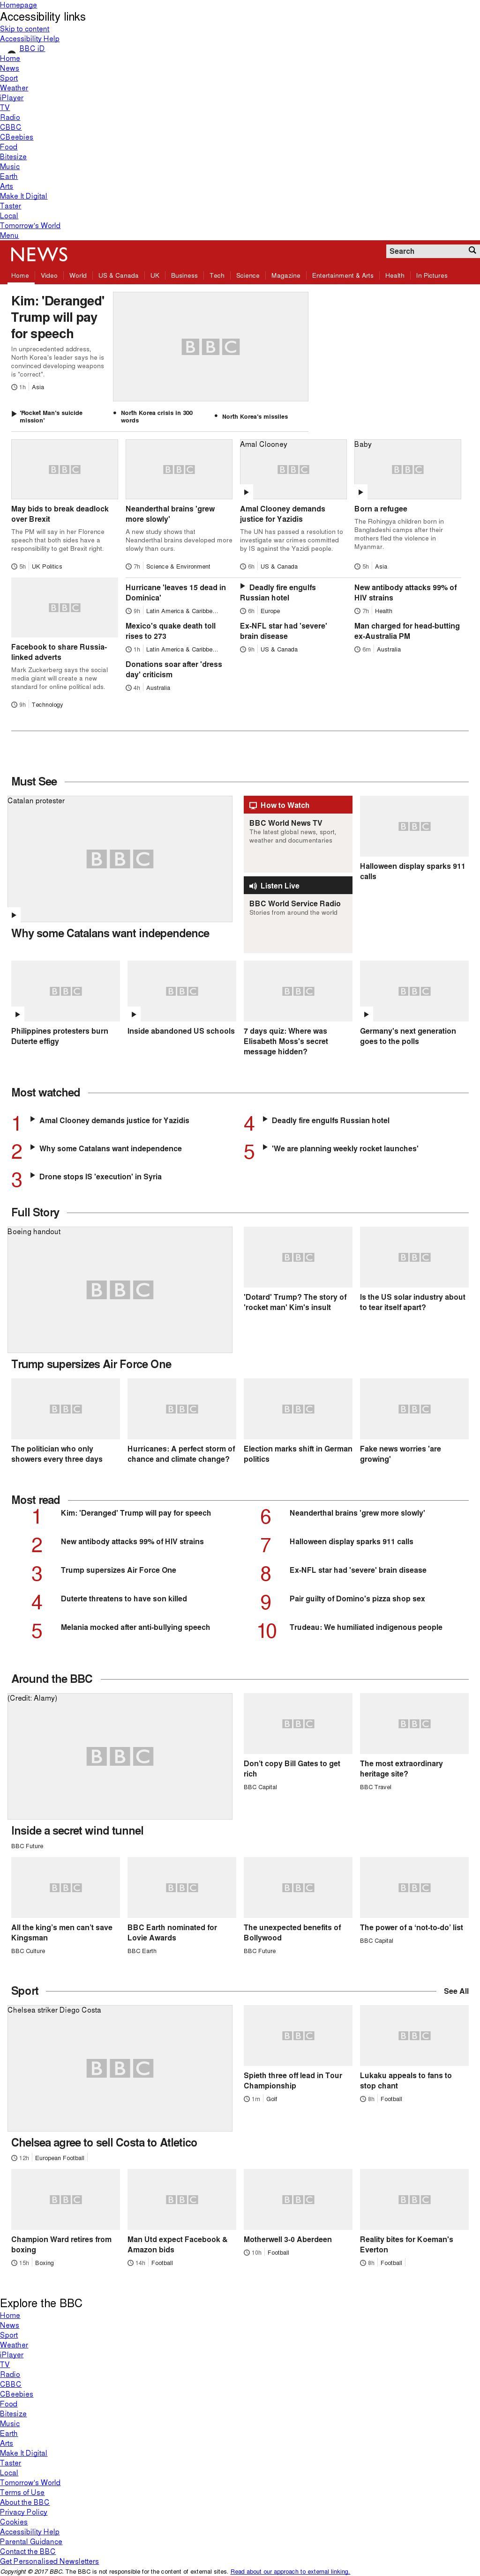 BBC at Friday Sept. 22, 2017, 7 a.m. UTC